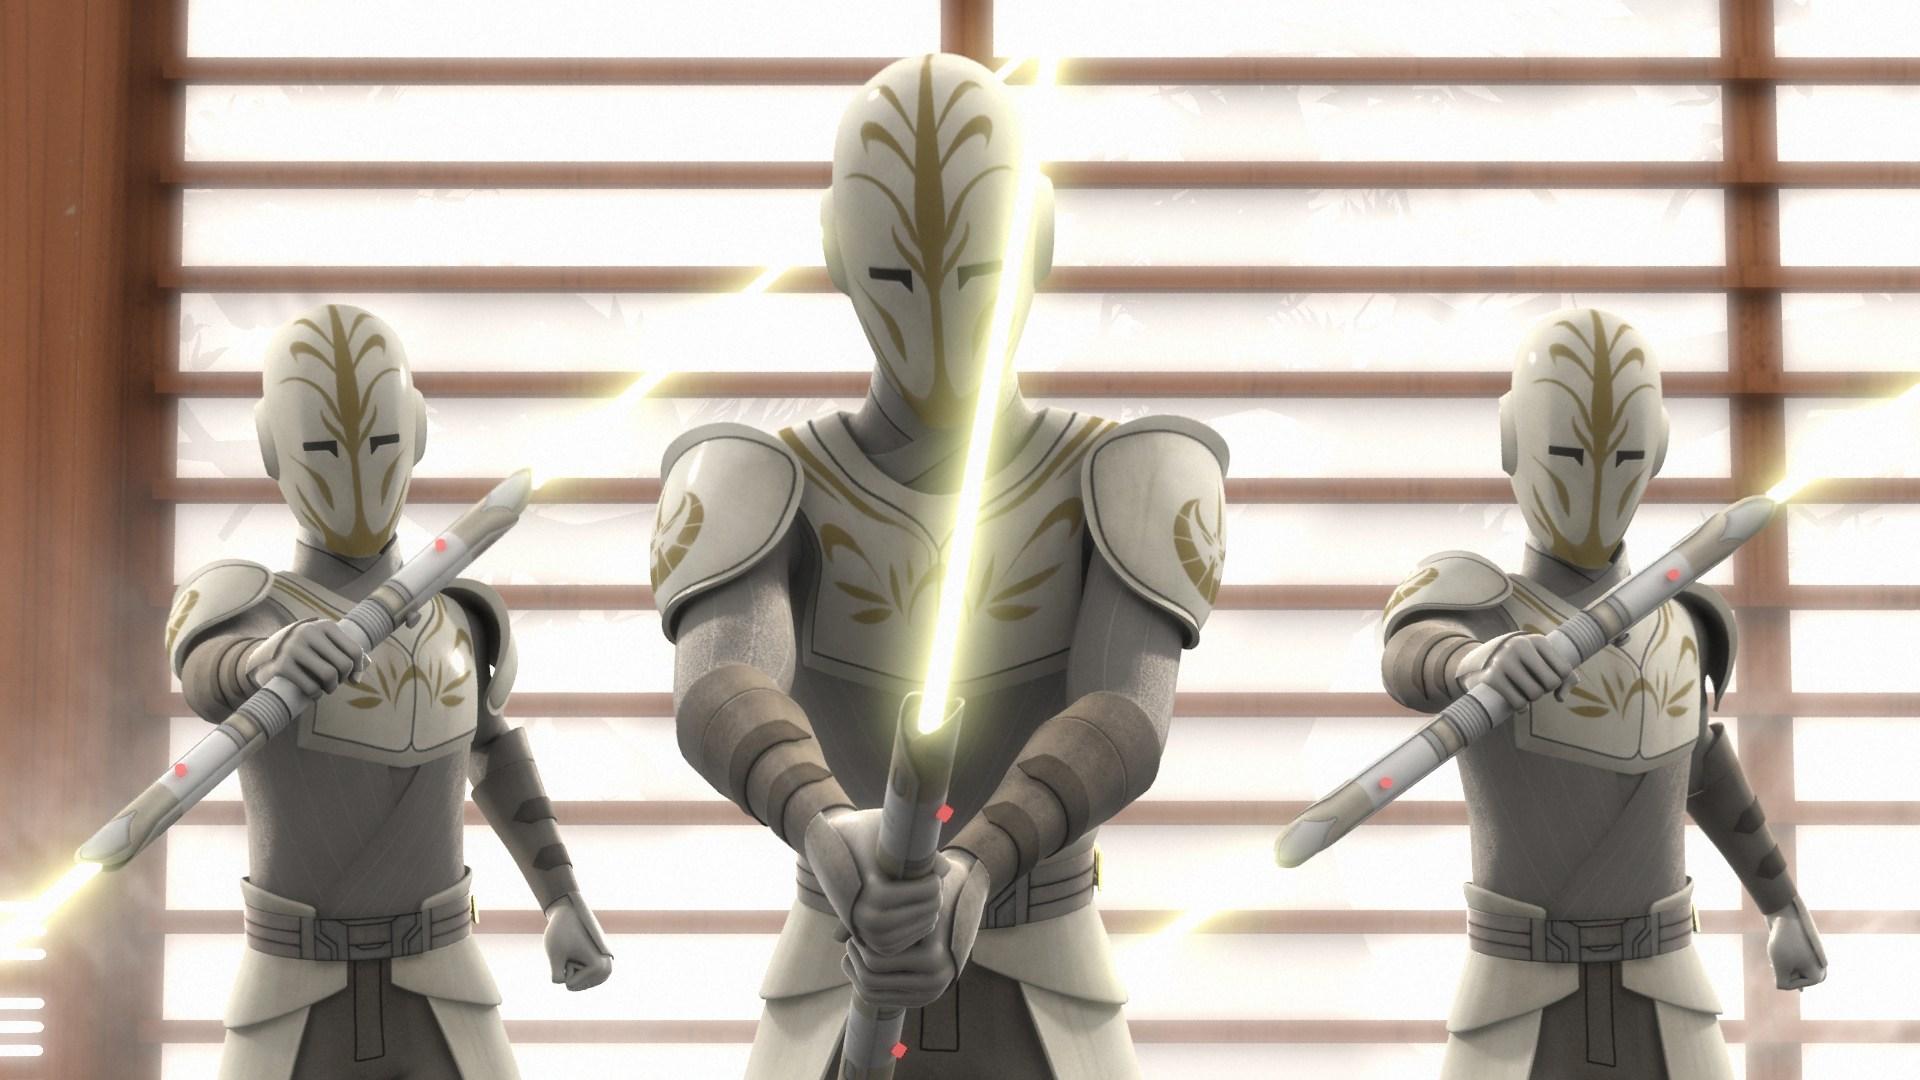 Jedi Temple Guard Star Wars Rebels Wiki Fandom Powered By Wikia